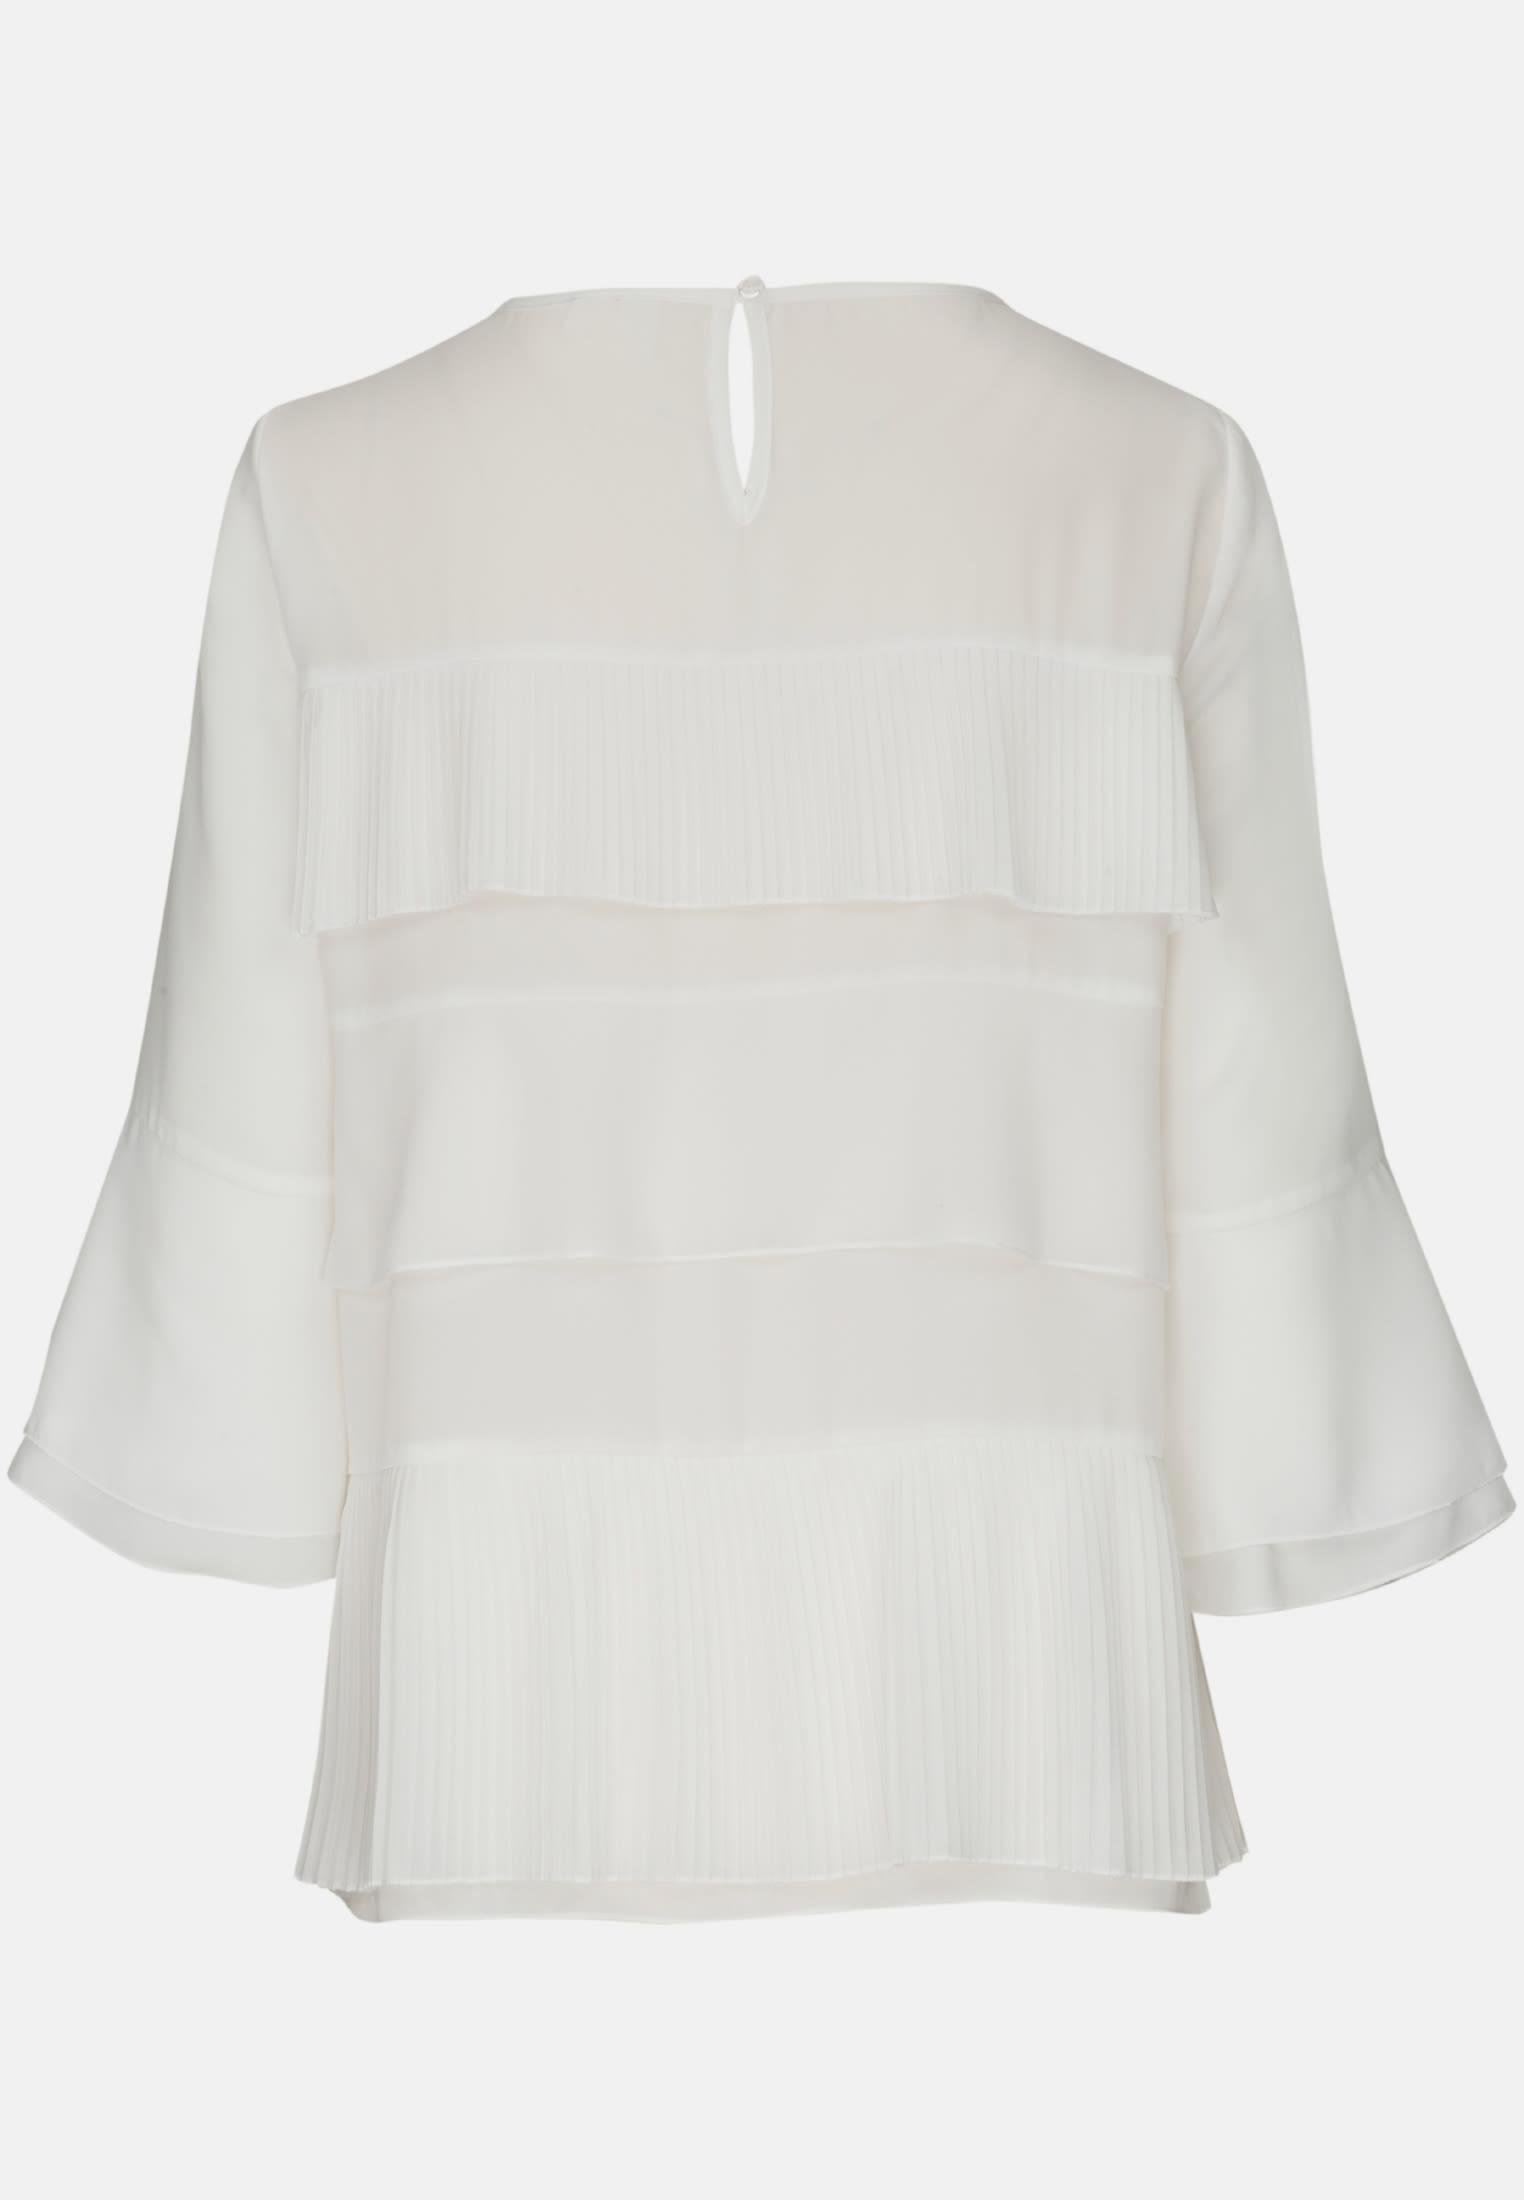 3/4 sleeve Chiffon Shirt Blouse aus 100% Polyester in Ecru |  Seidensticker Onlineshop